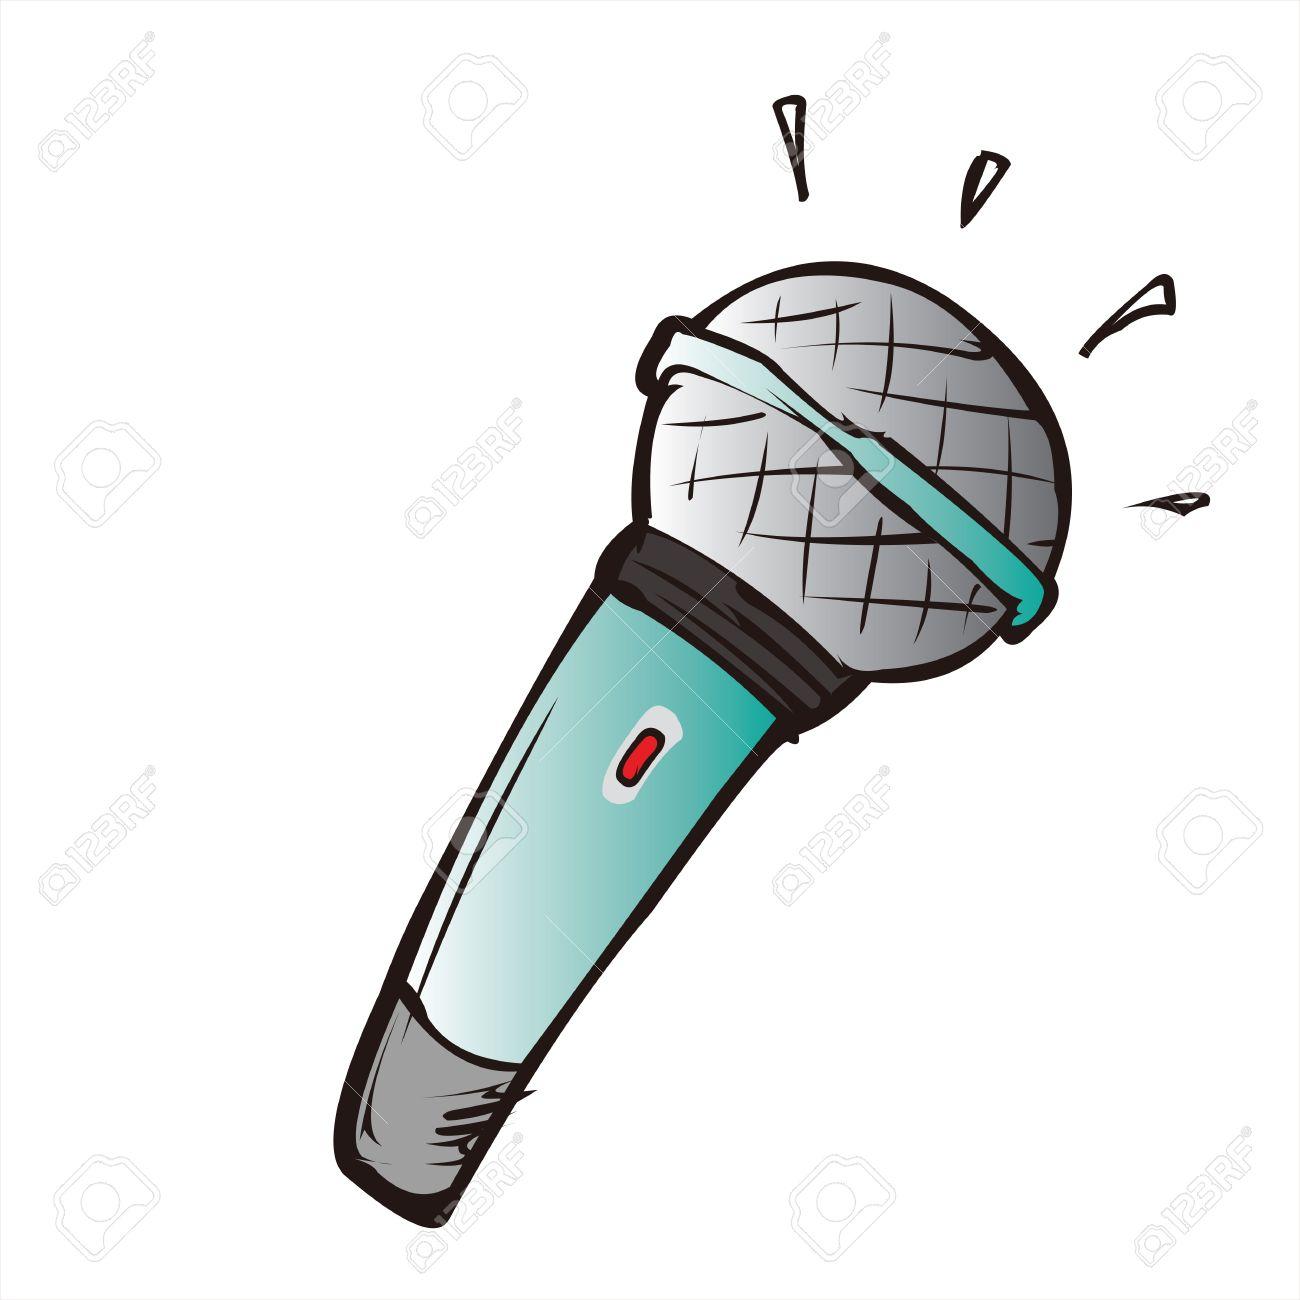 Dibujos Animados Del Micrófono